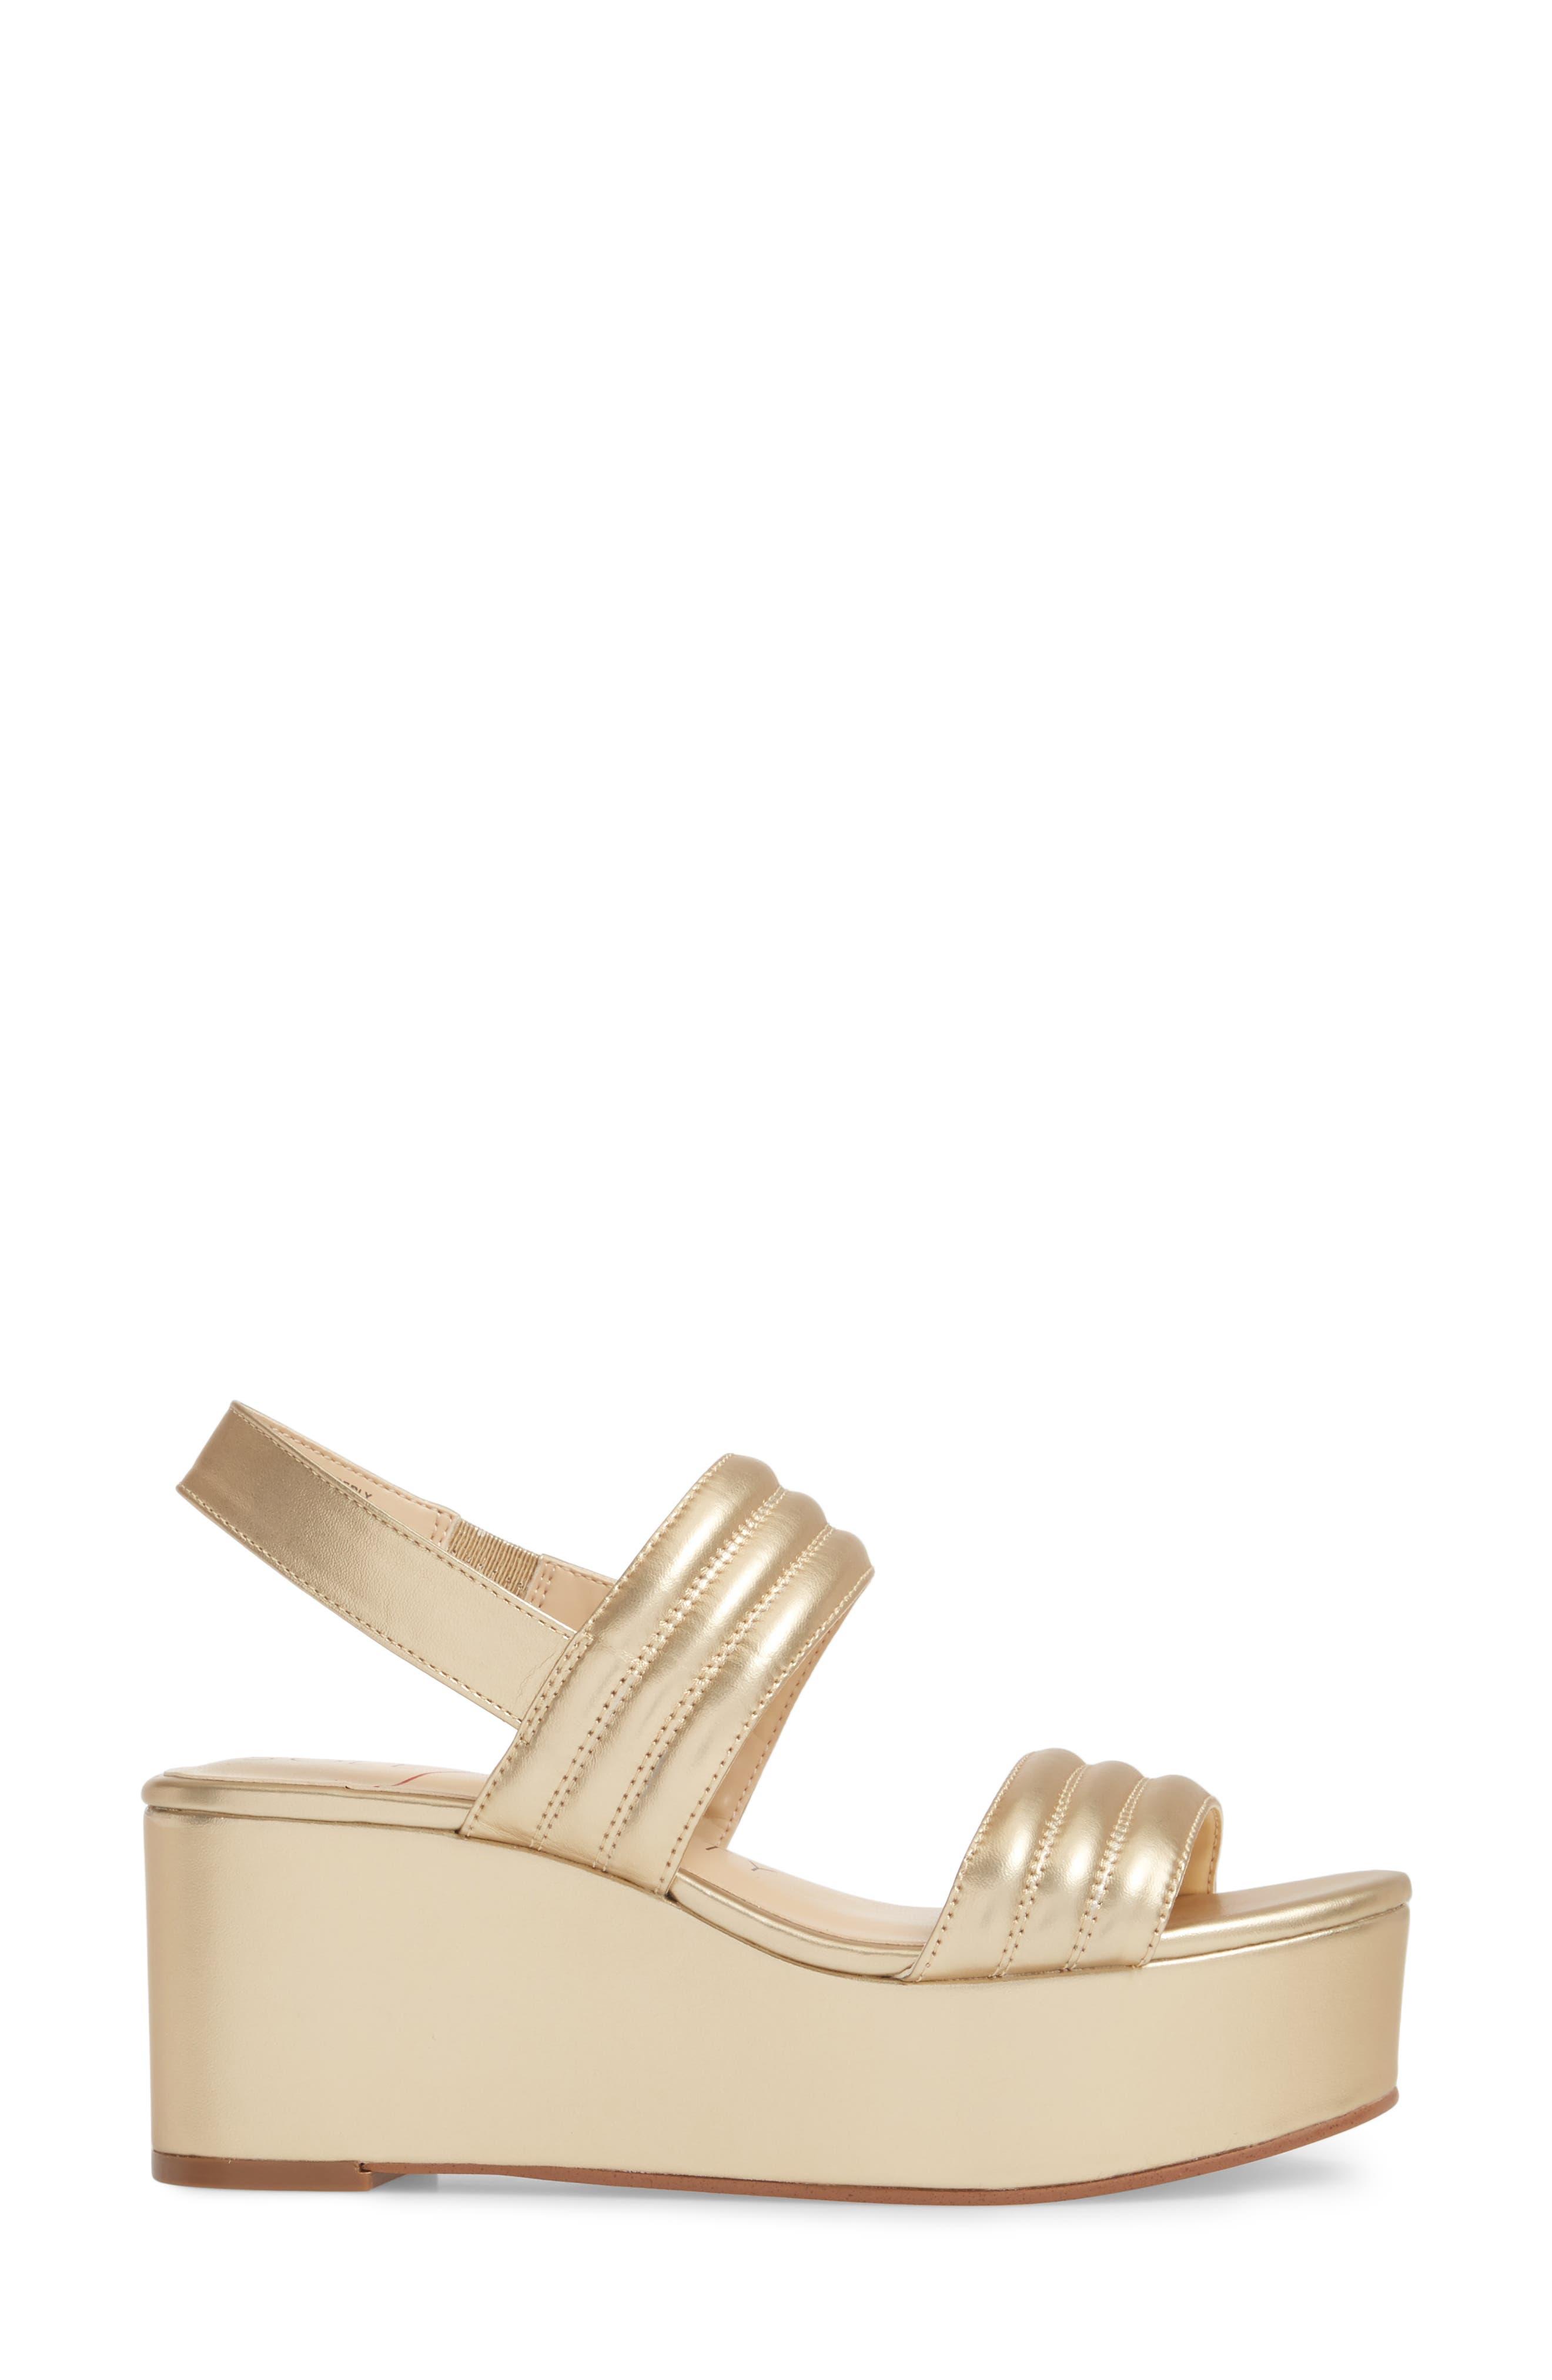 Amberly Platform Sandal,                             Alternate thumbnail 10, color,